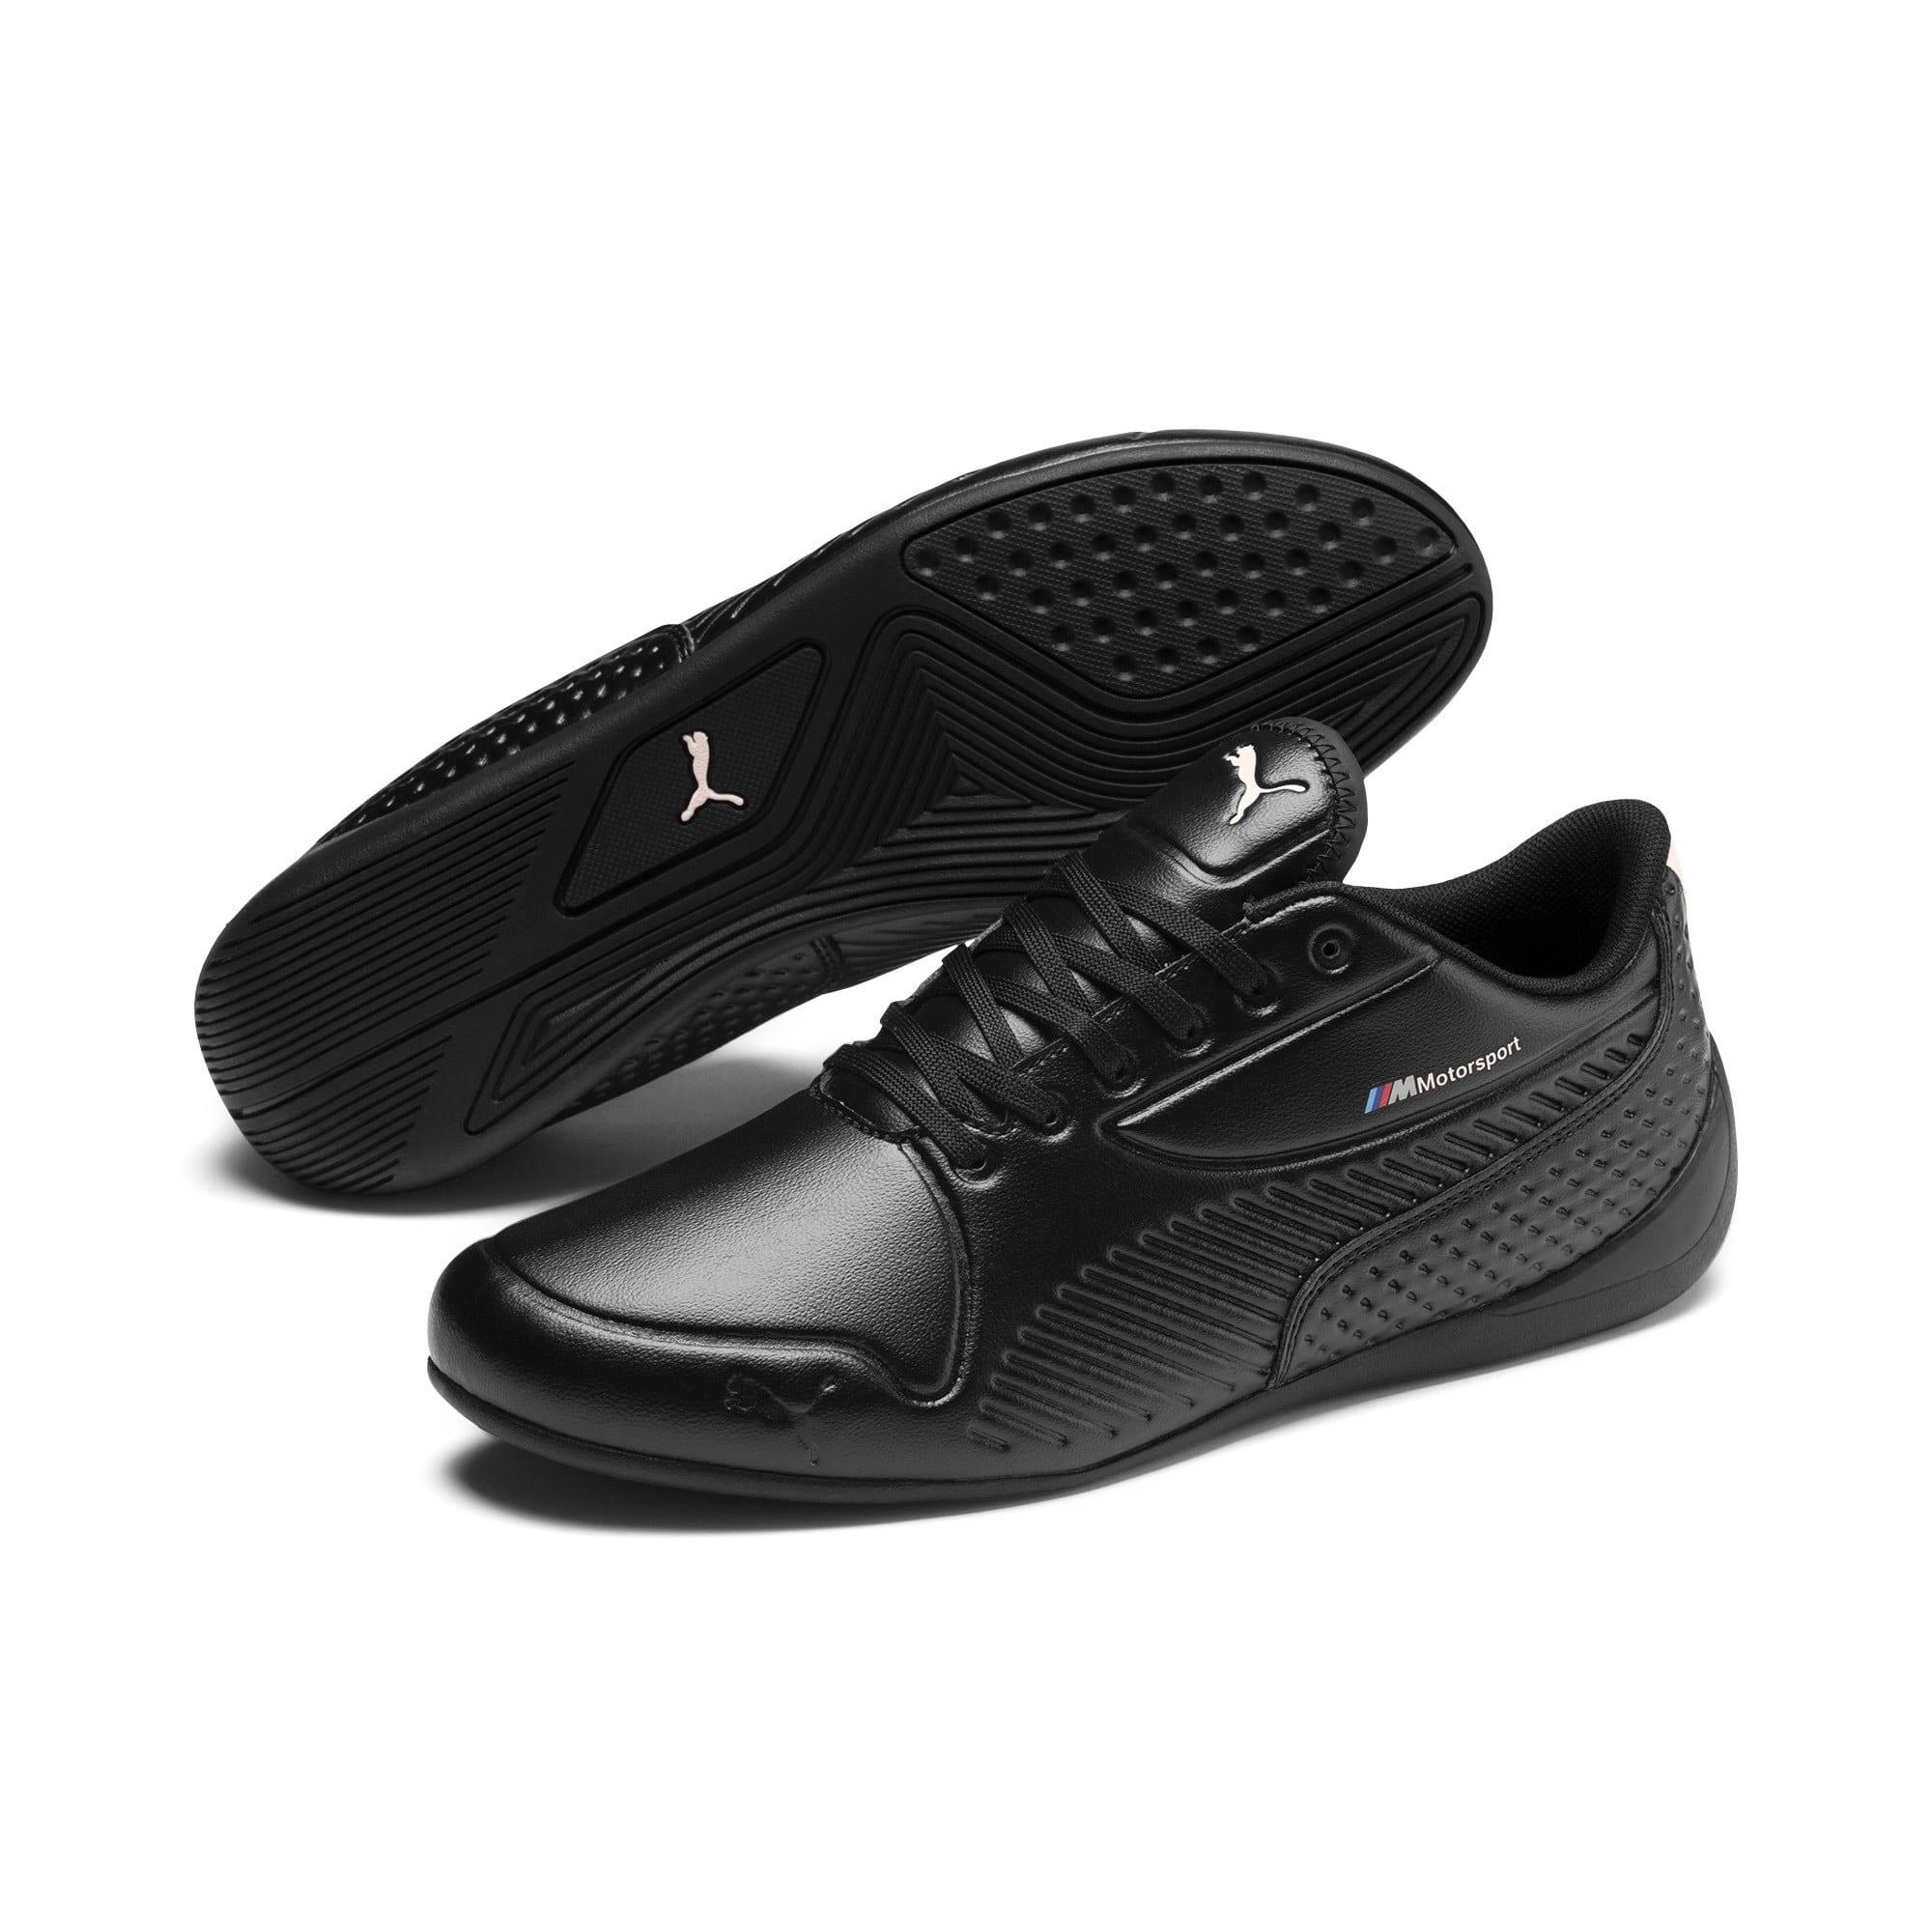 Thumbnail 3 of BMW M Motorsport Drift Cat 7S Ultra Shoes, Puma Black-Puma White, medium